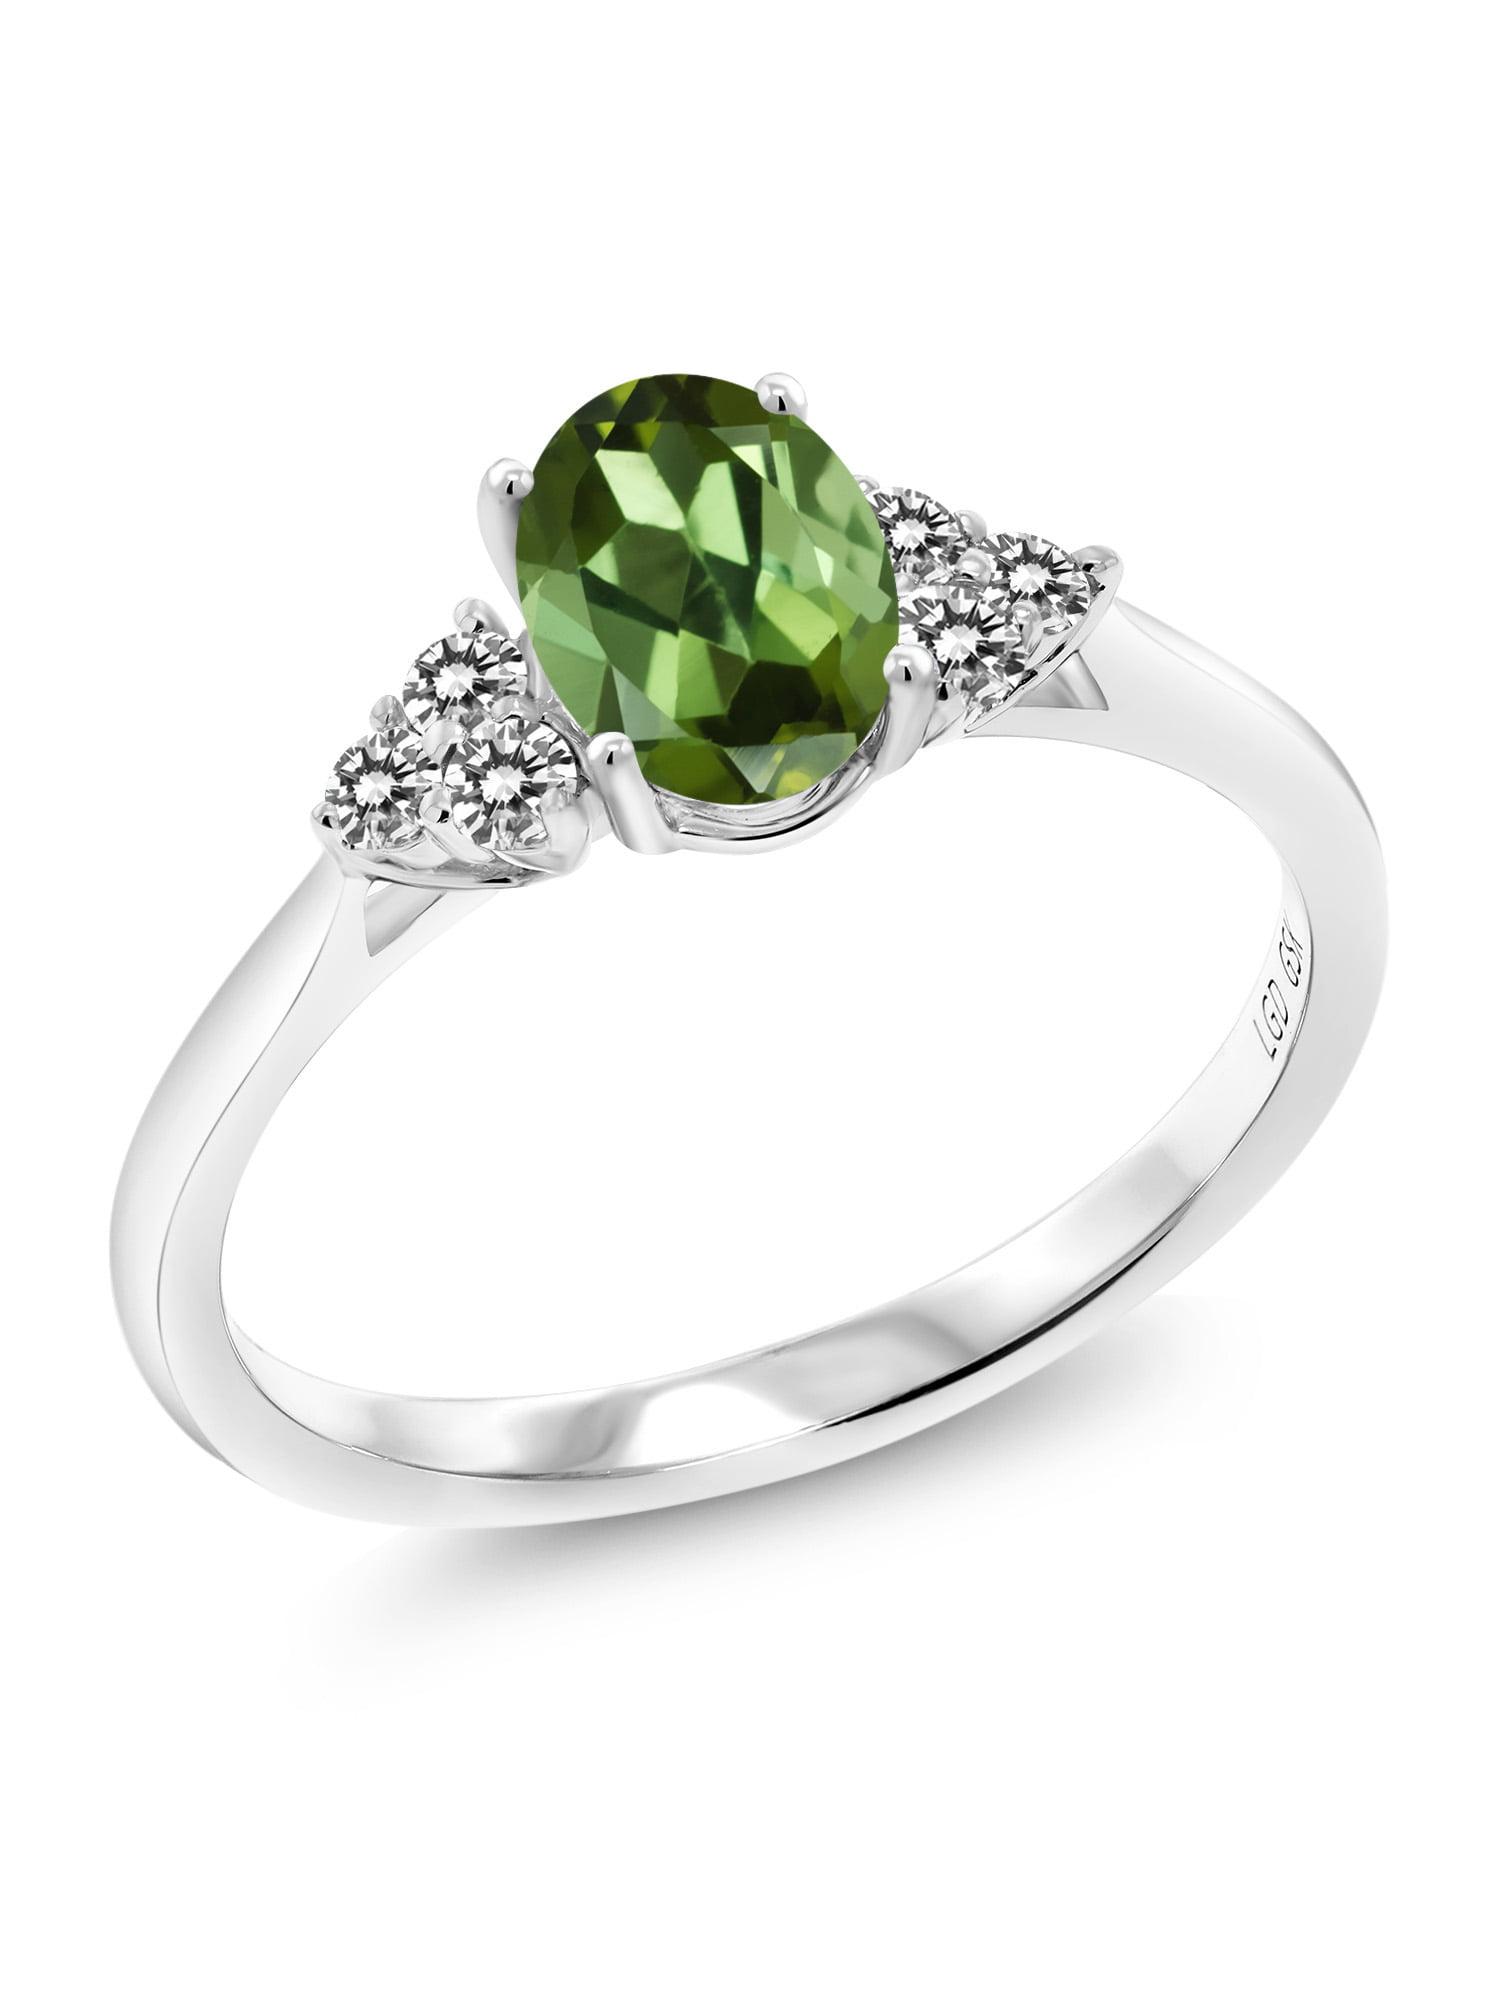 0.90 Ct Oval Green Tourmaline White Diamond 10K White Gold Ring by